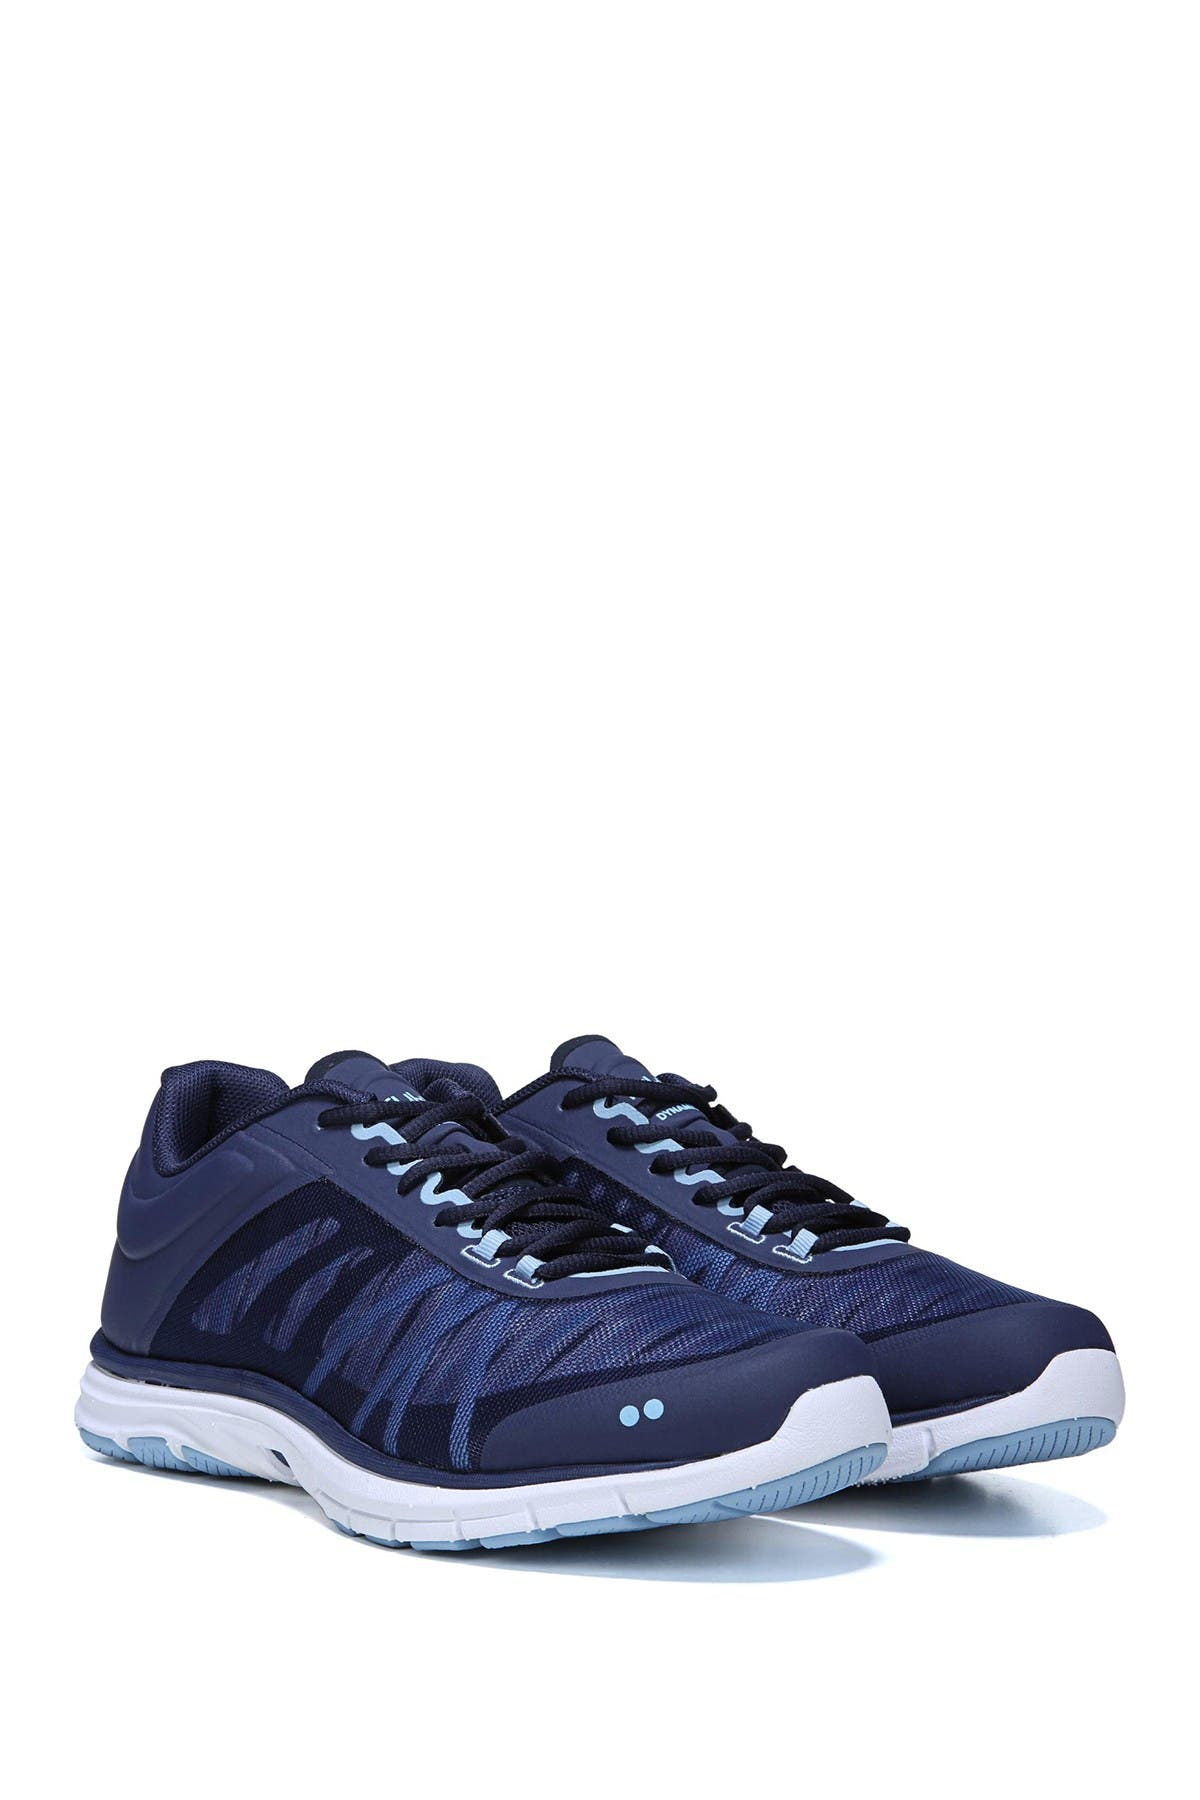 Image of Ryka Dynamic 2.5 Sneaker